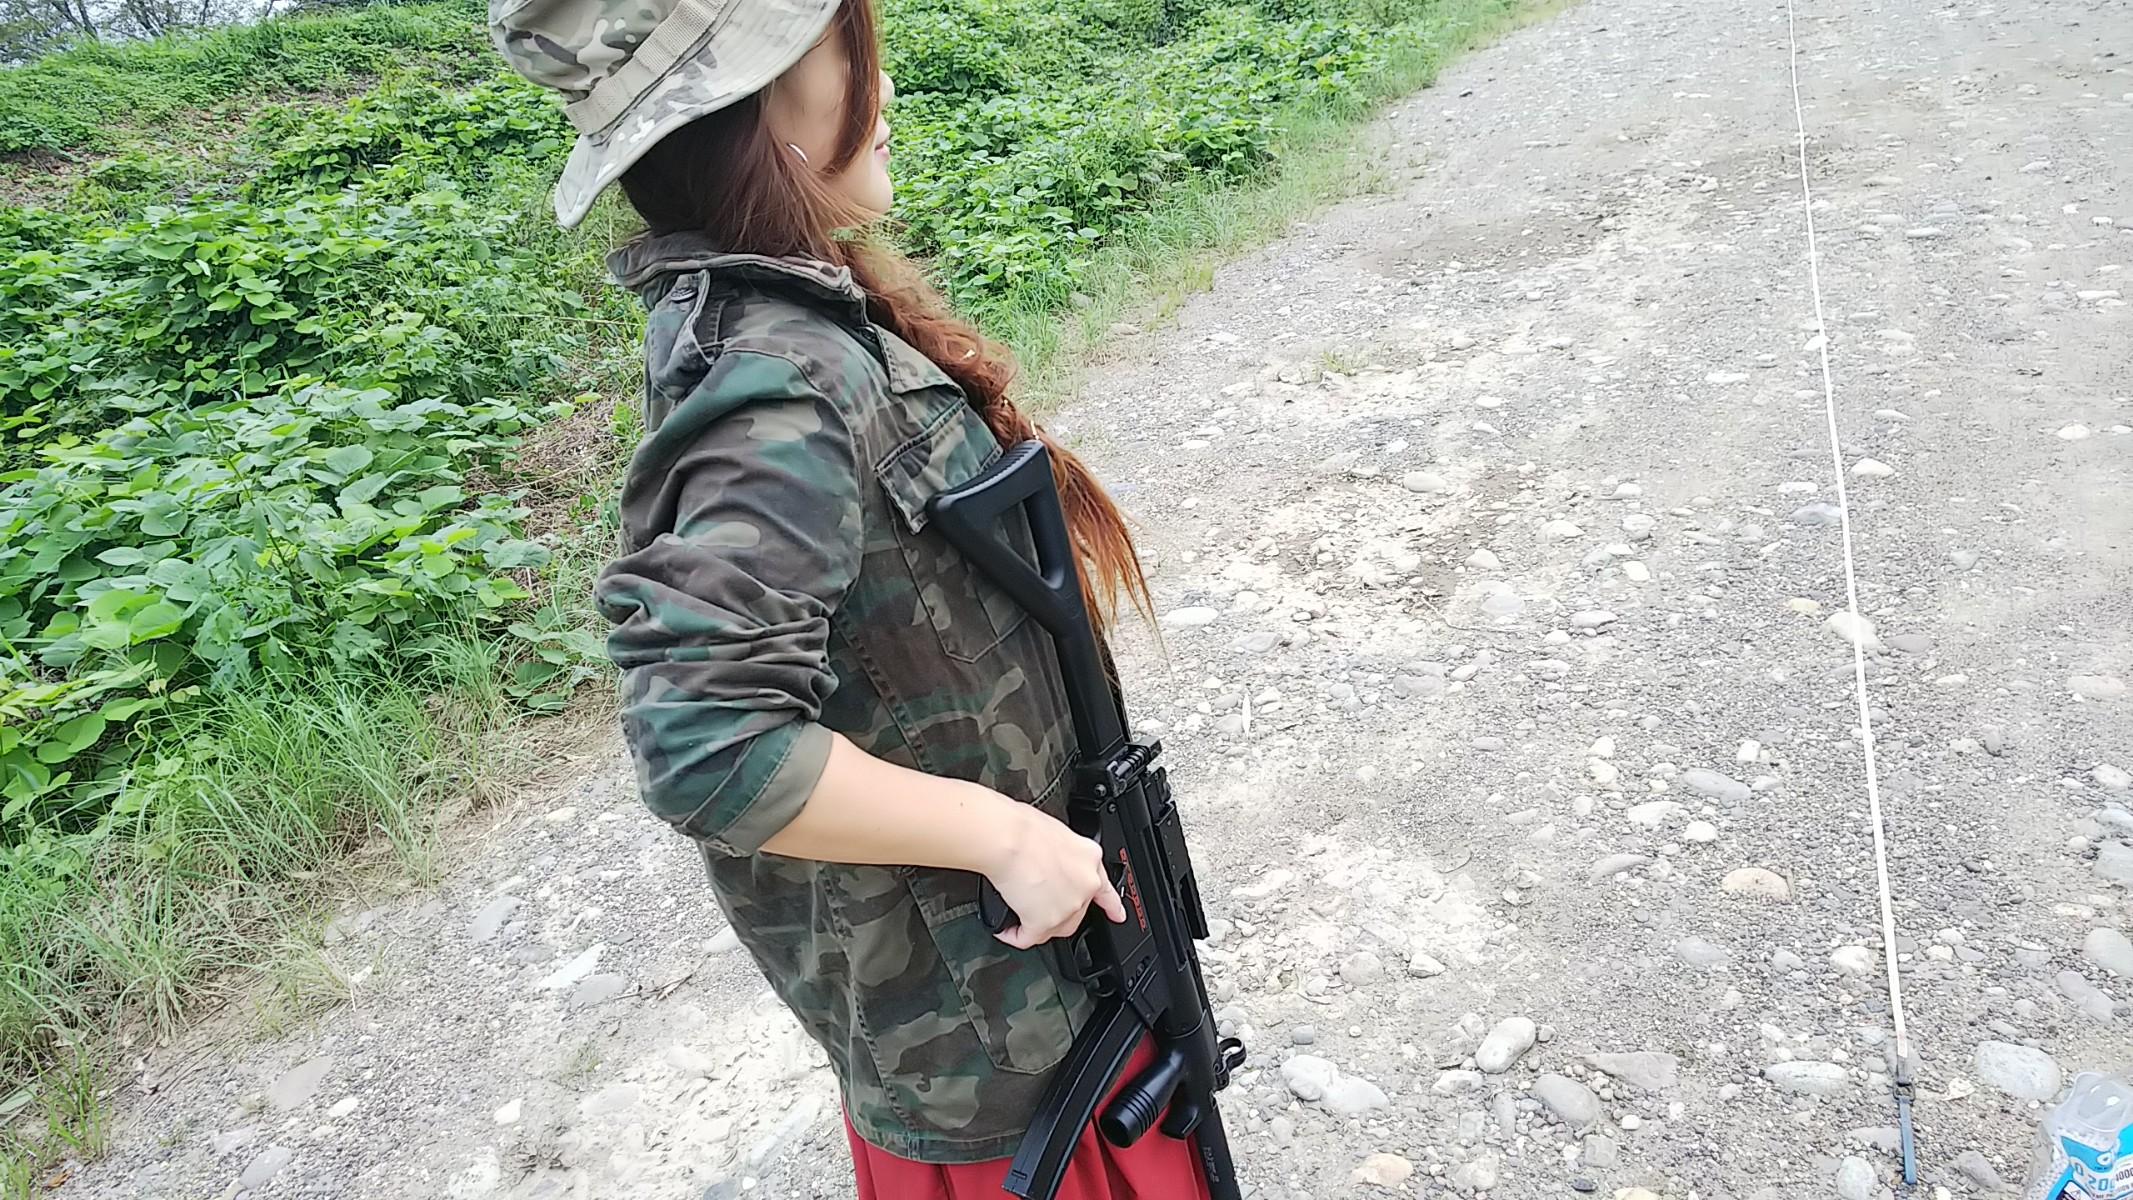 MP5KPDW